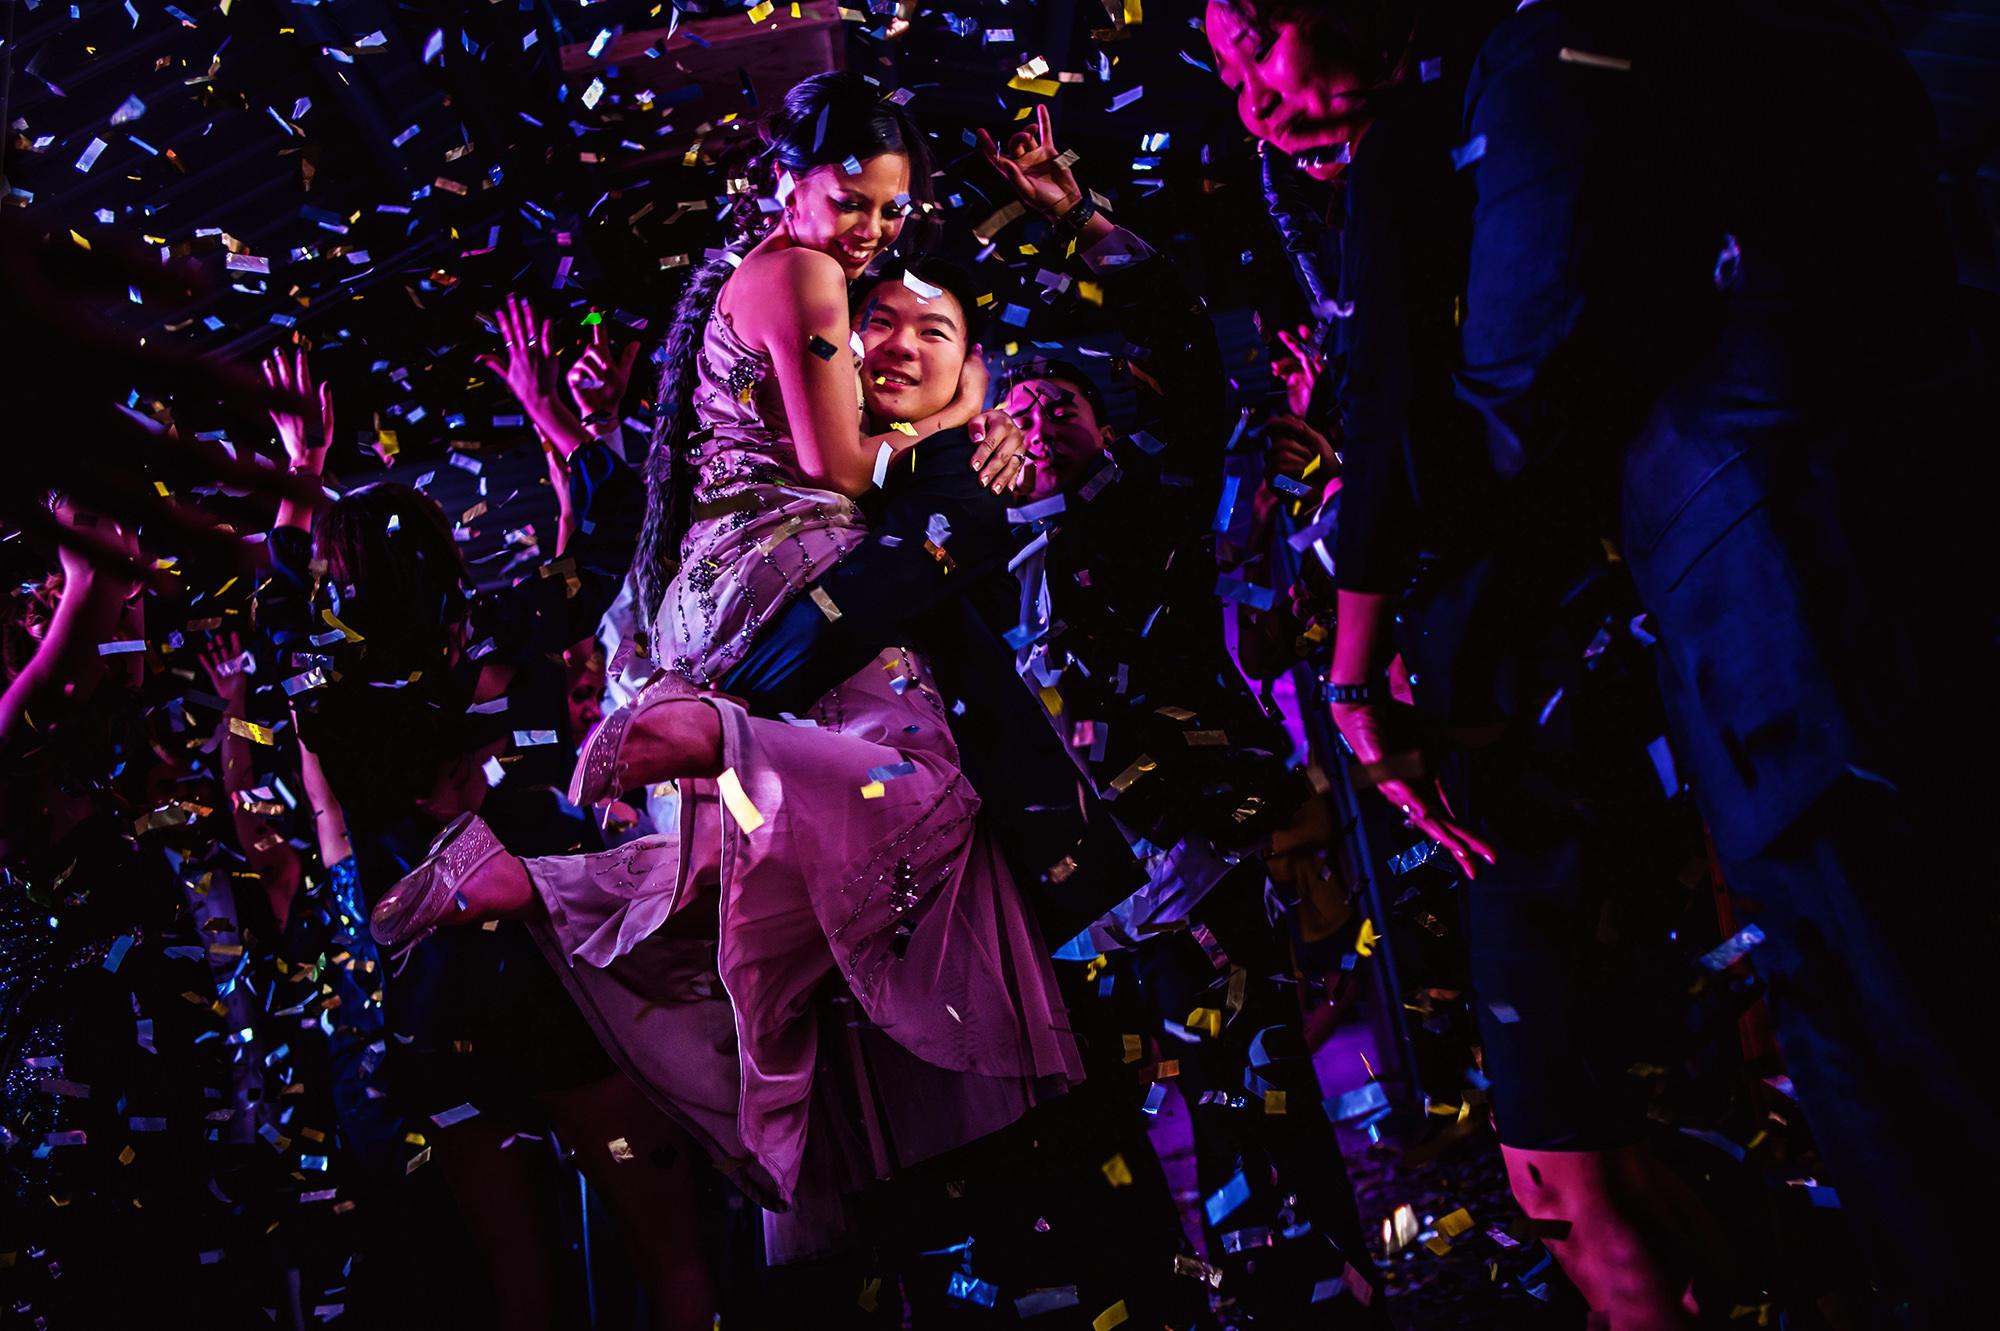 groom-picks-bride-up-during-confetti-explosion-wedding-dance-party-worlds-best-wedding-photos-davina-plus-daniel-canada-wedding-photographers